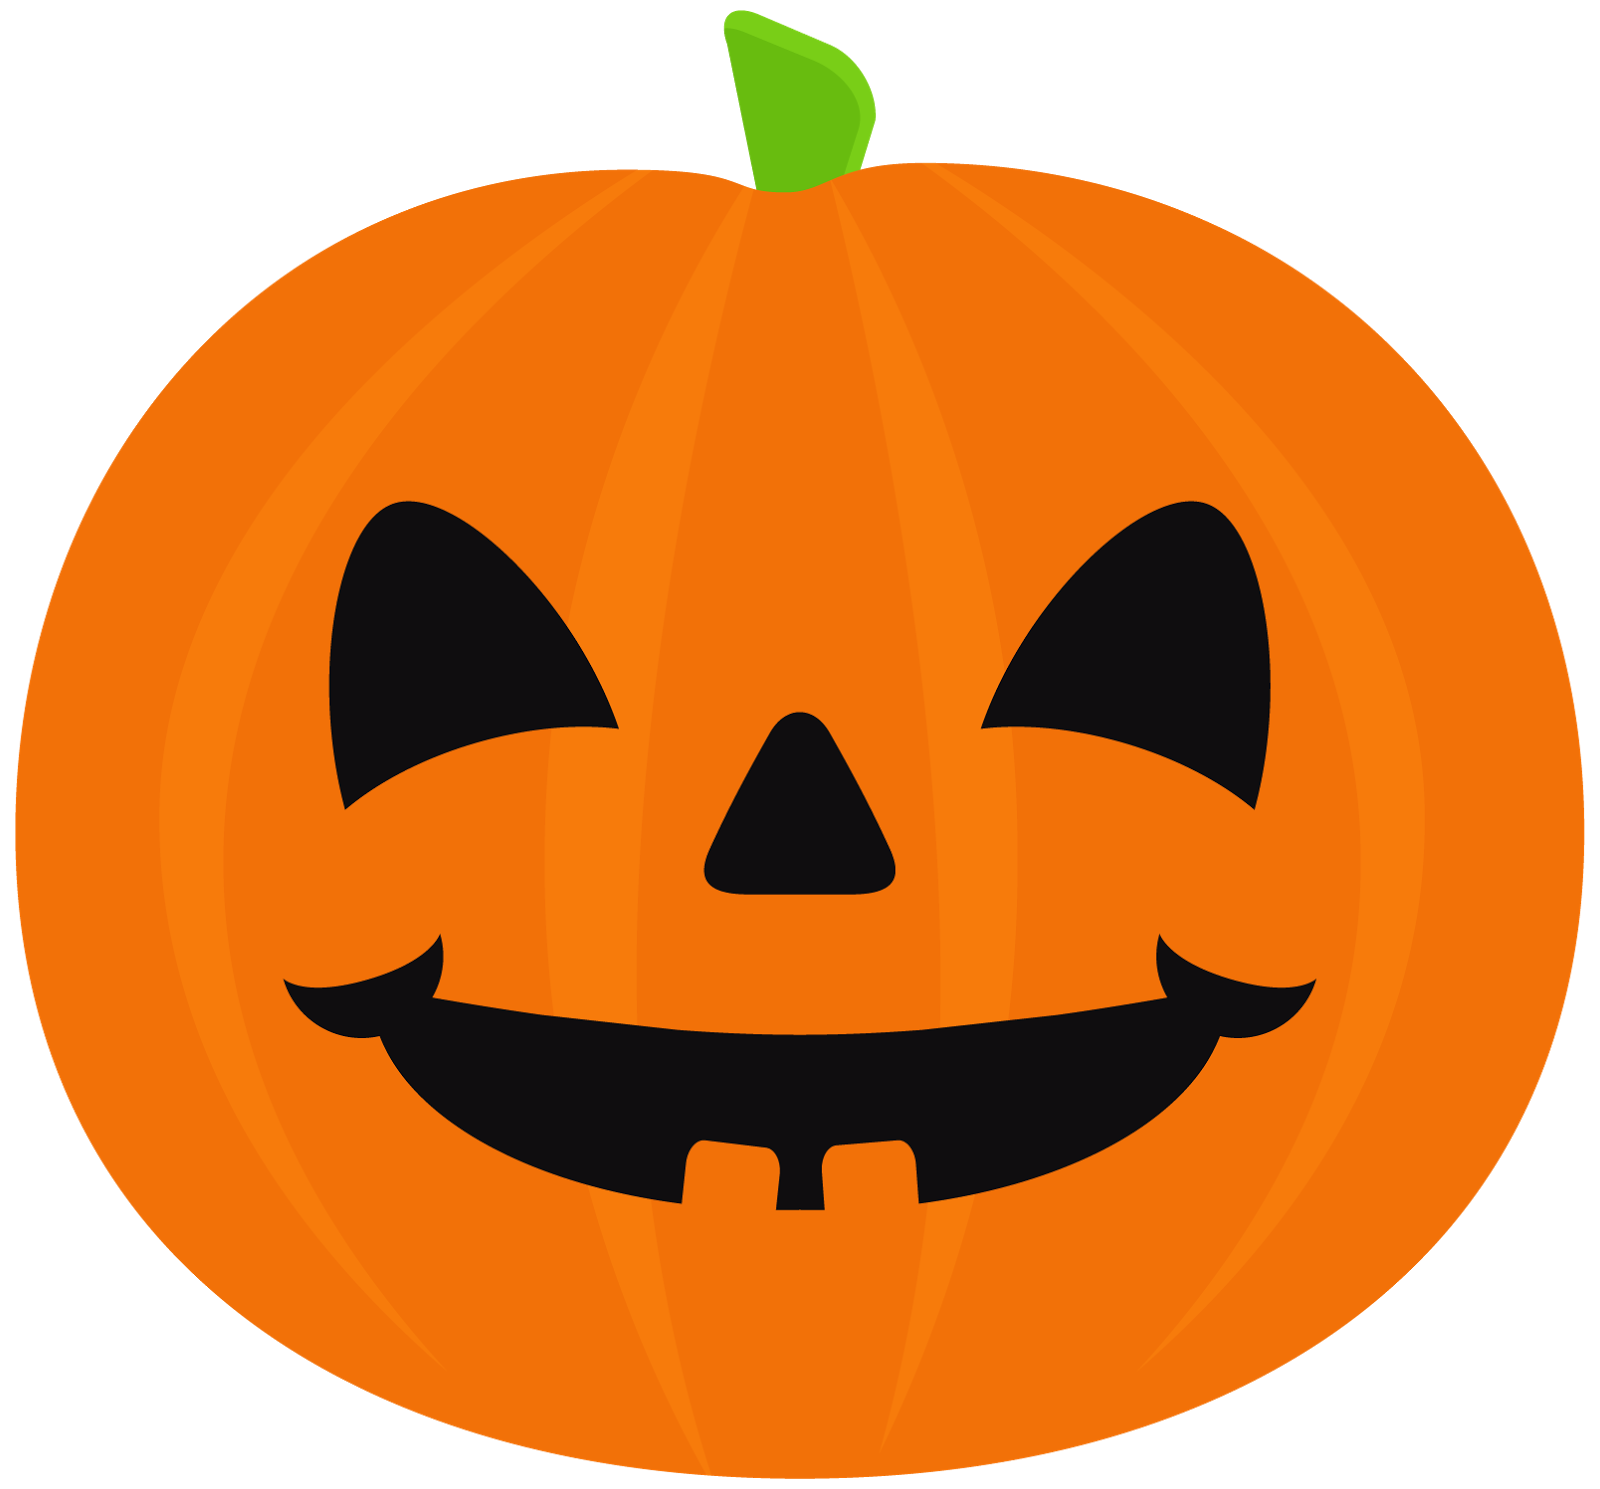 Halloween Pumpkin Clipart. - Oh My Fiesta! in english